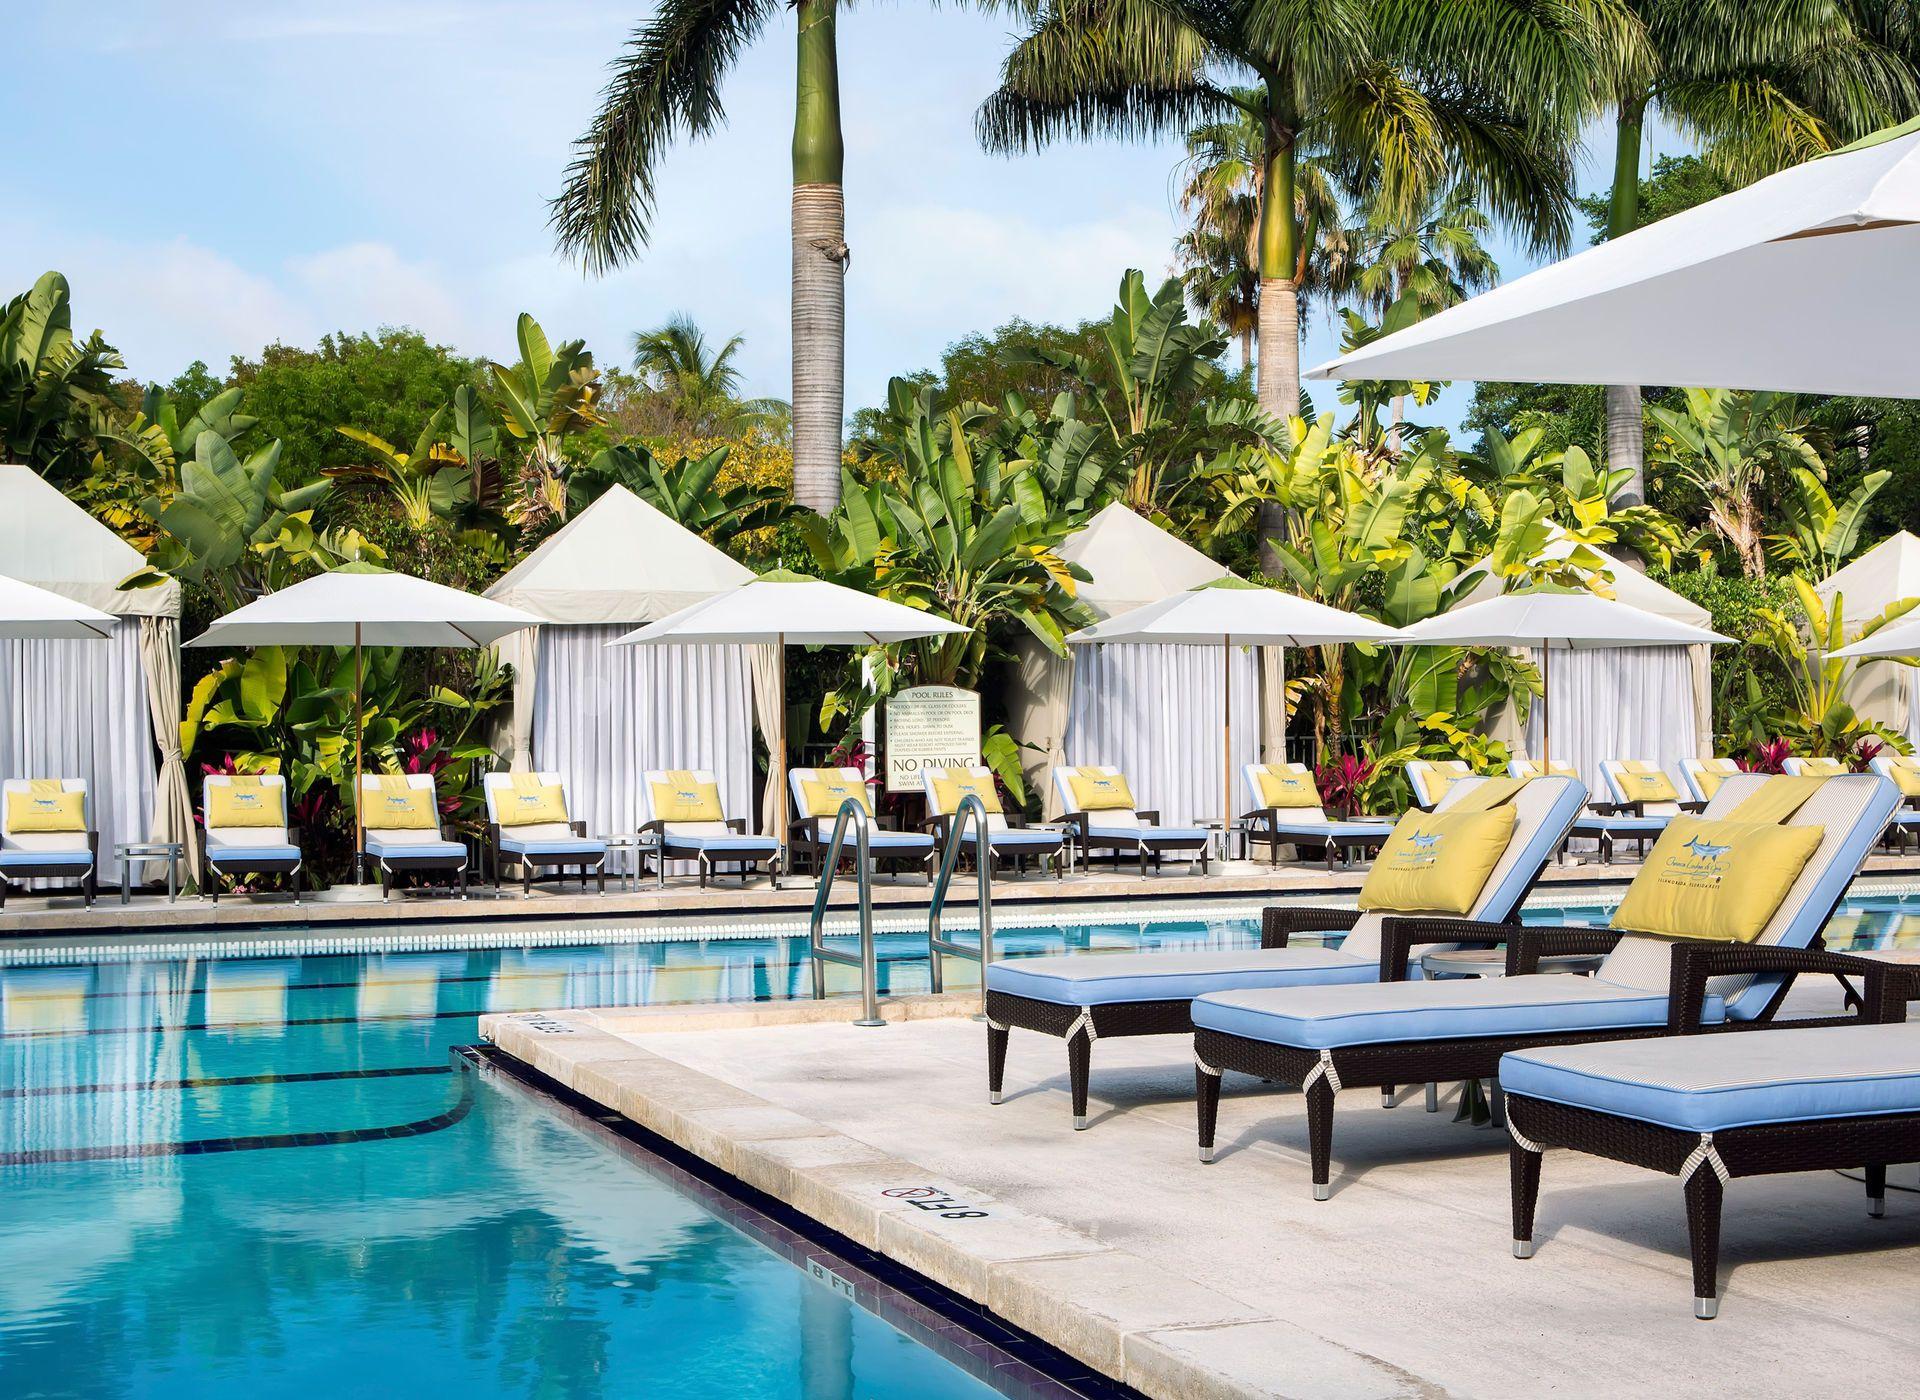 9 Best Hotels In The Florida Keys